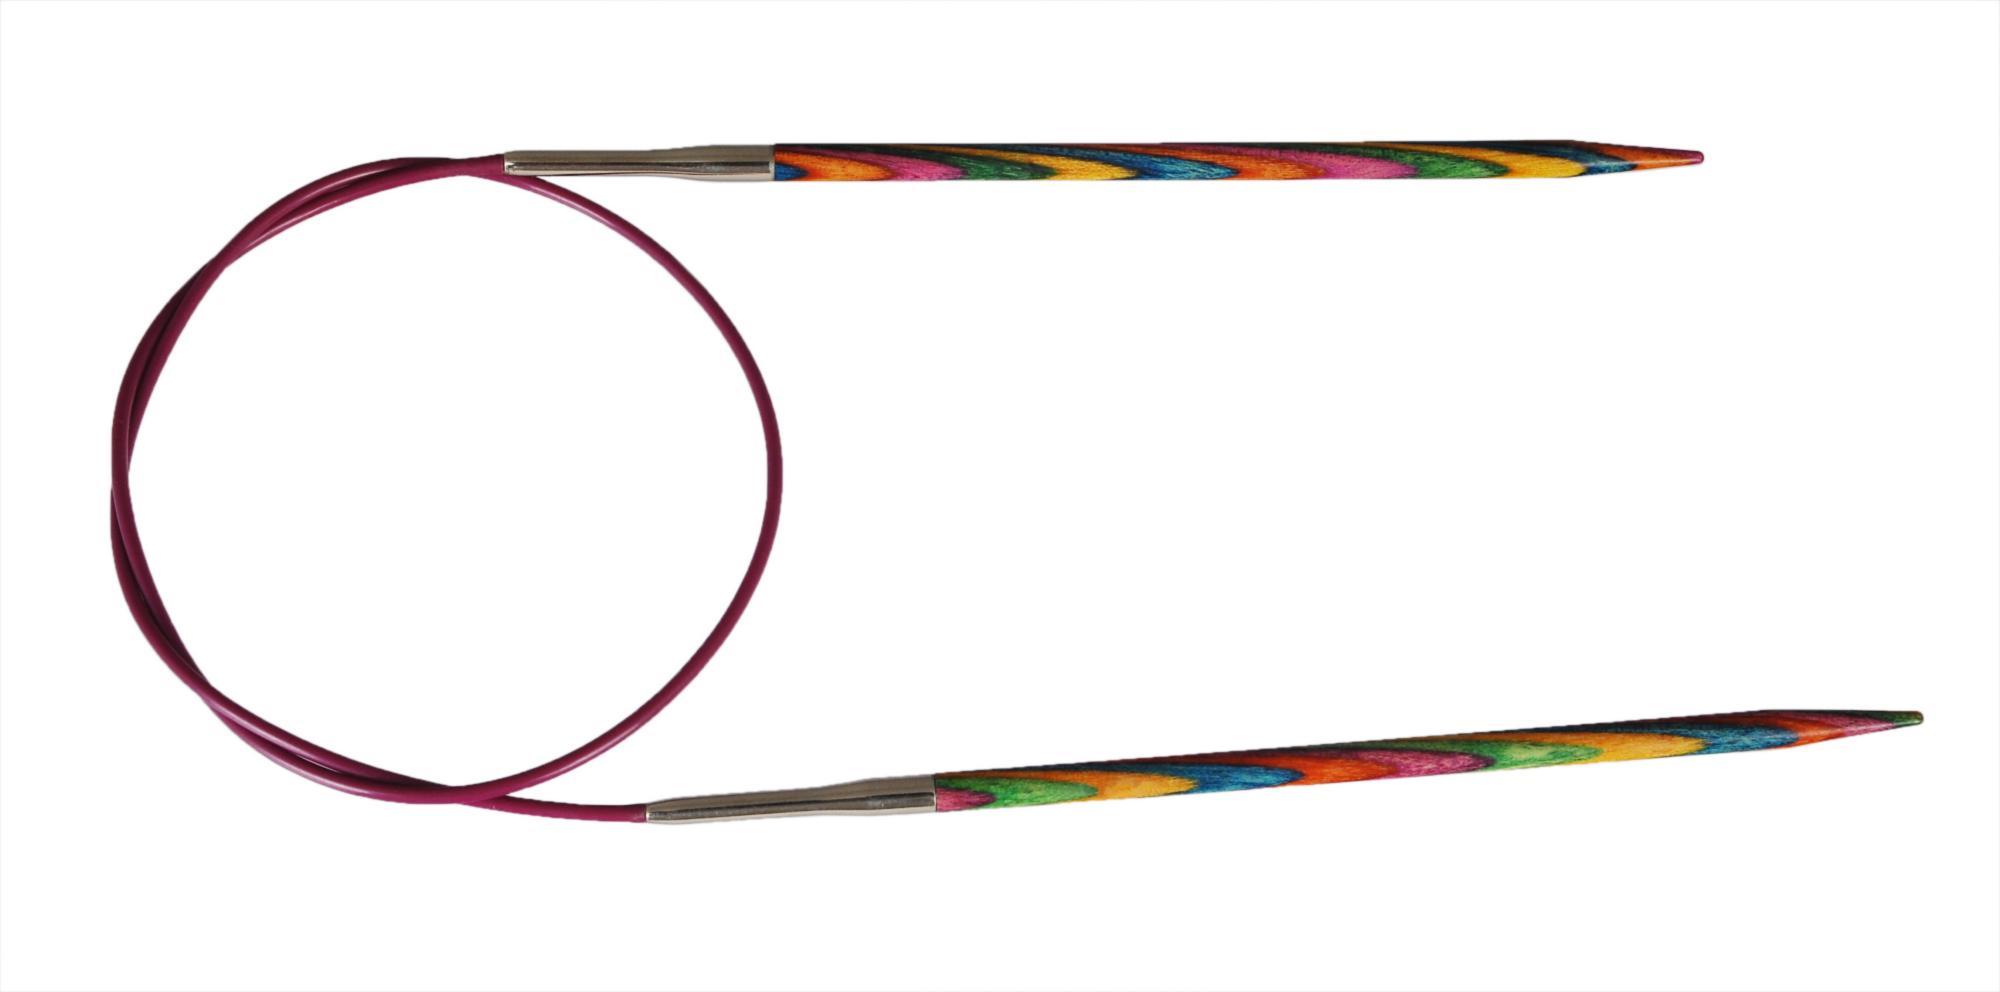 Спицы круговые 80 см Symfonie Wood KnitPro, 21347, 12.00 мм